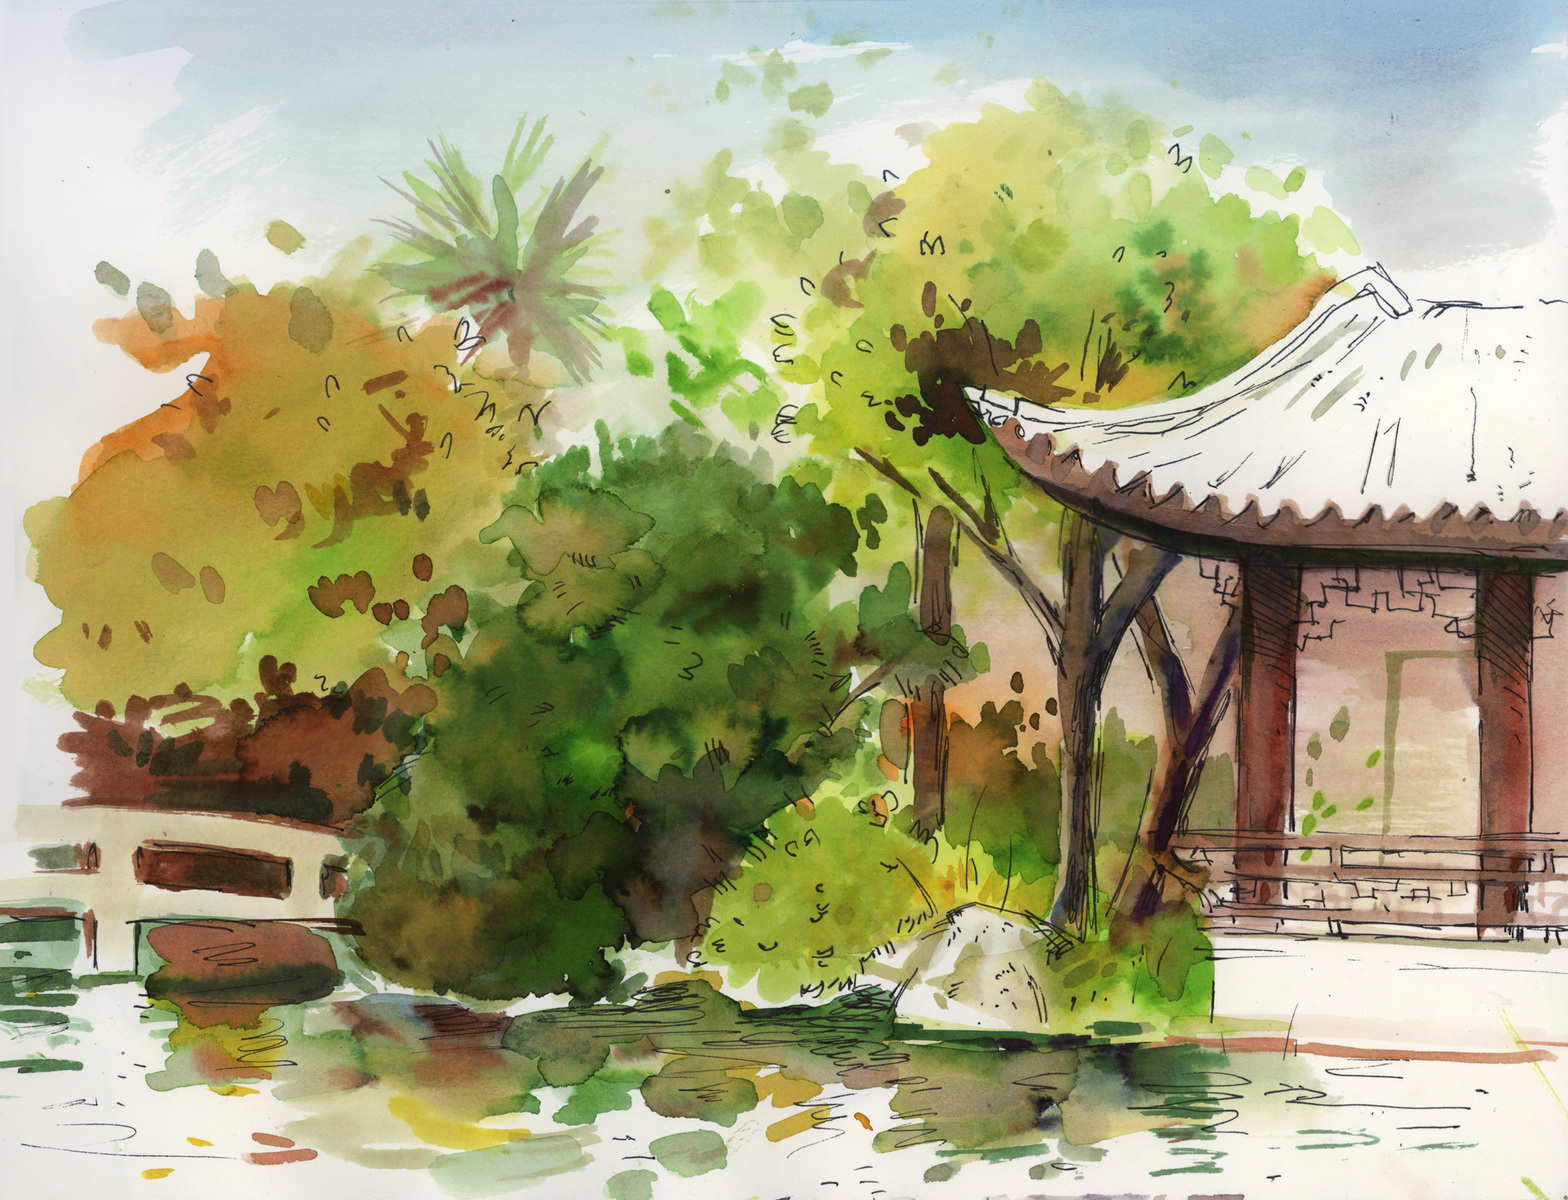 megan wood illustration - Lan Su Gardens